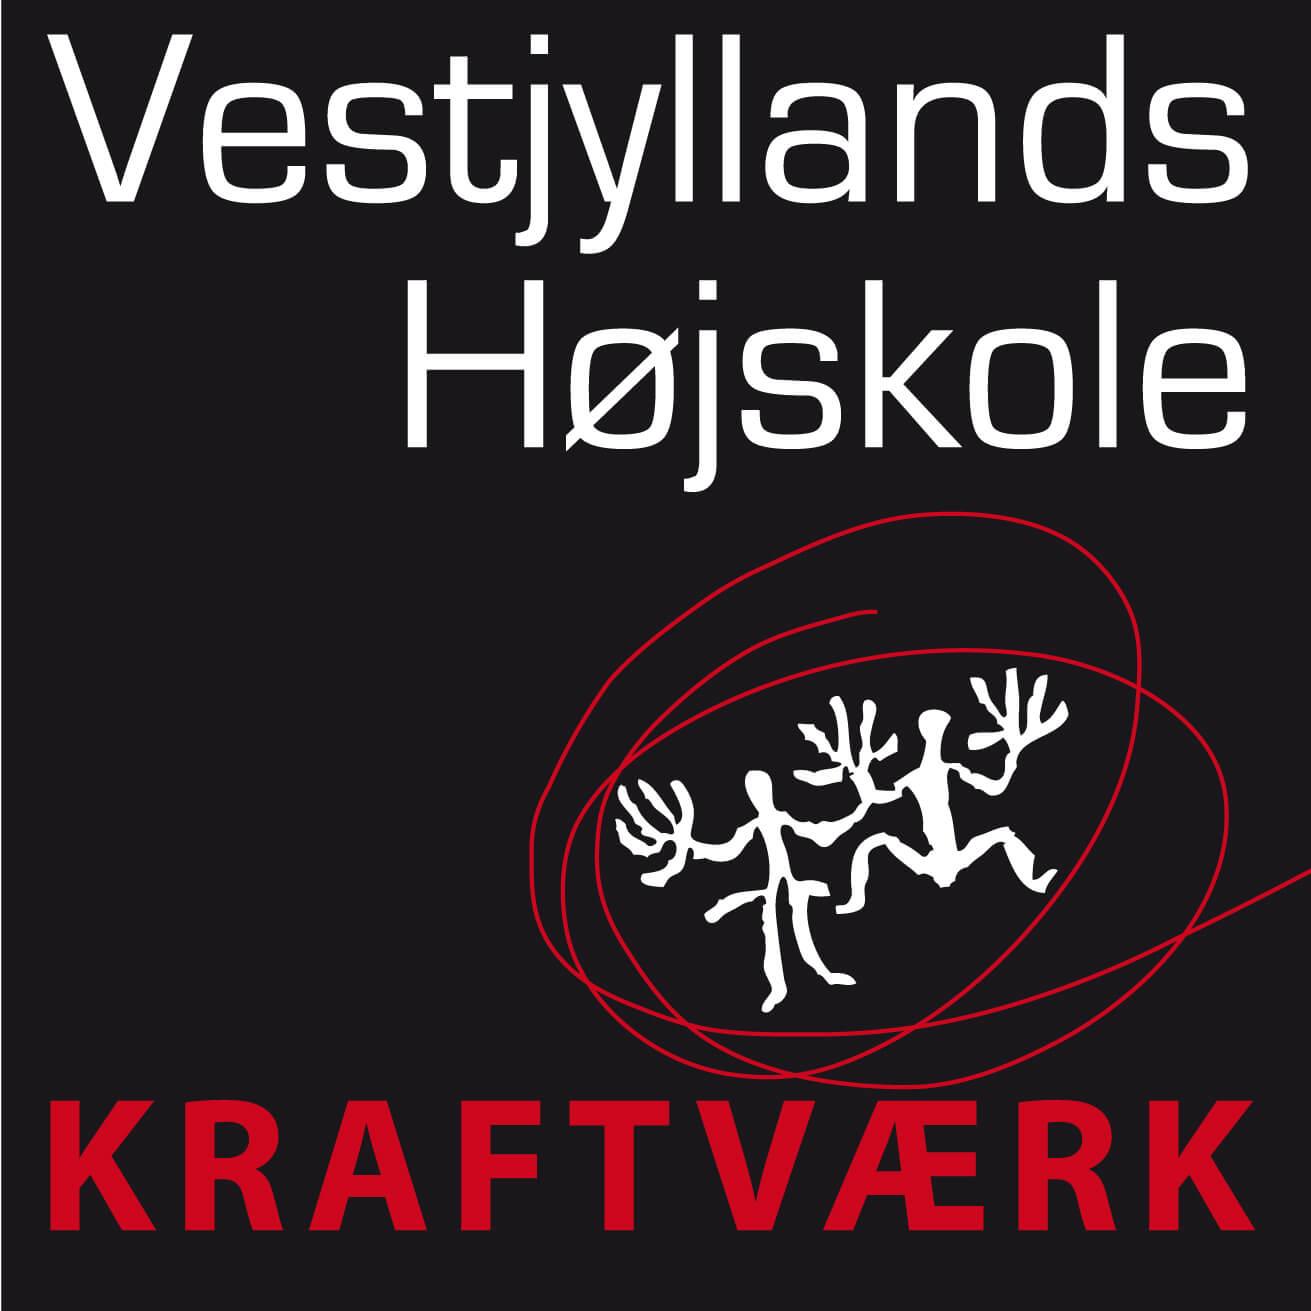 Vestjyllads Højskole - Vandreshoppen.dk